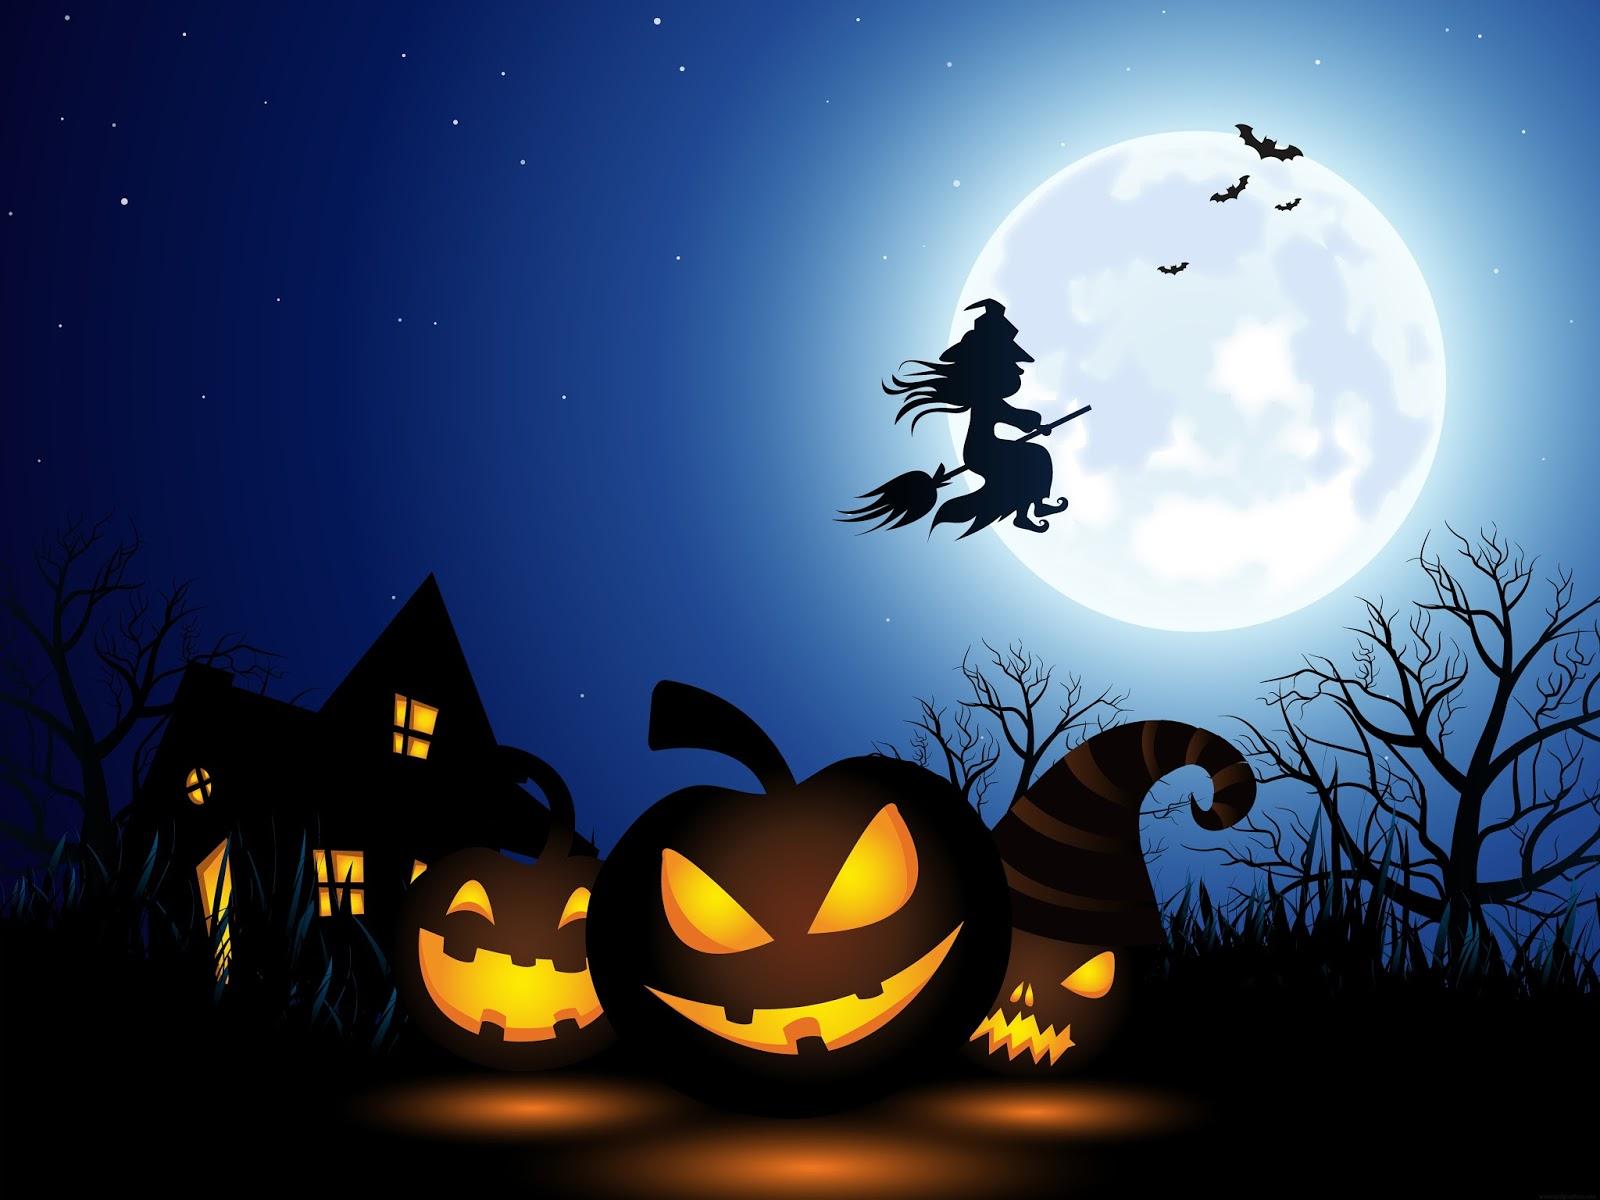 Cute Halloween Ghost Wallpaper Halloween Wallpapers Free Halloween Wallpapers Funny